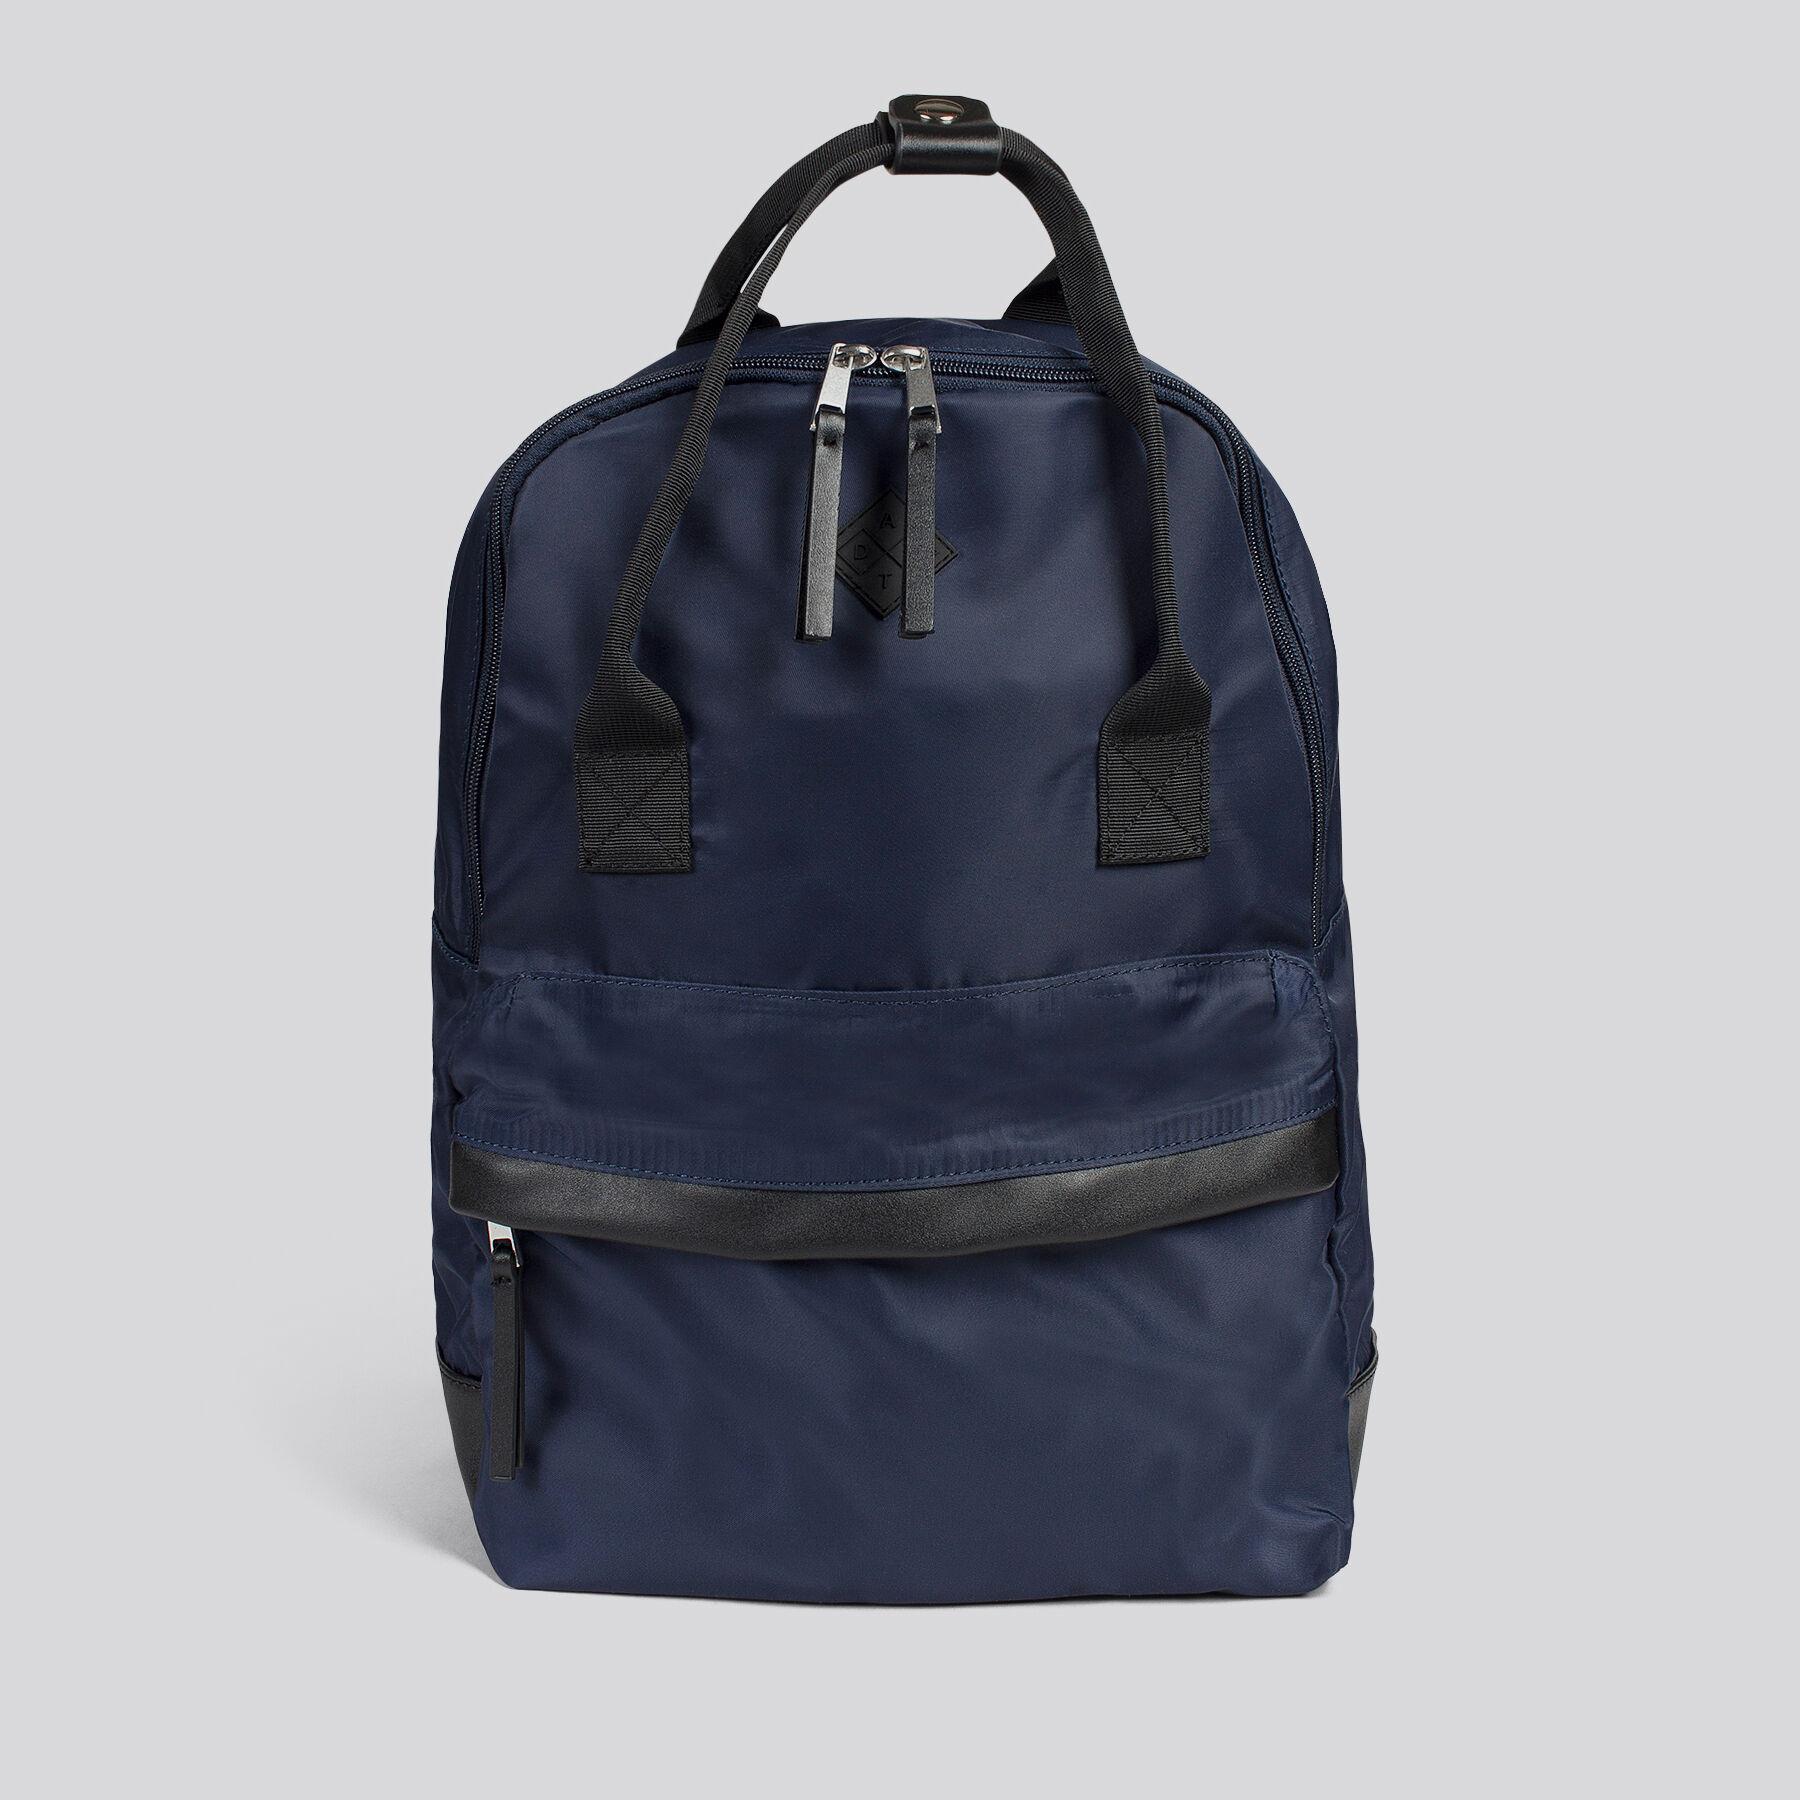 sac dos nylon avec anses bleu marine homme jules. Black Bedroom Furniture Sets. Home Design Ideas